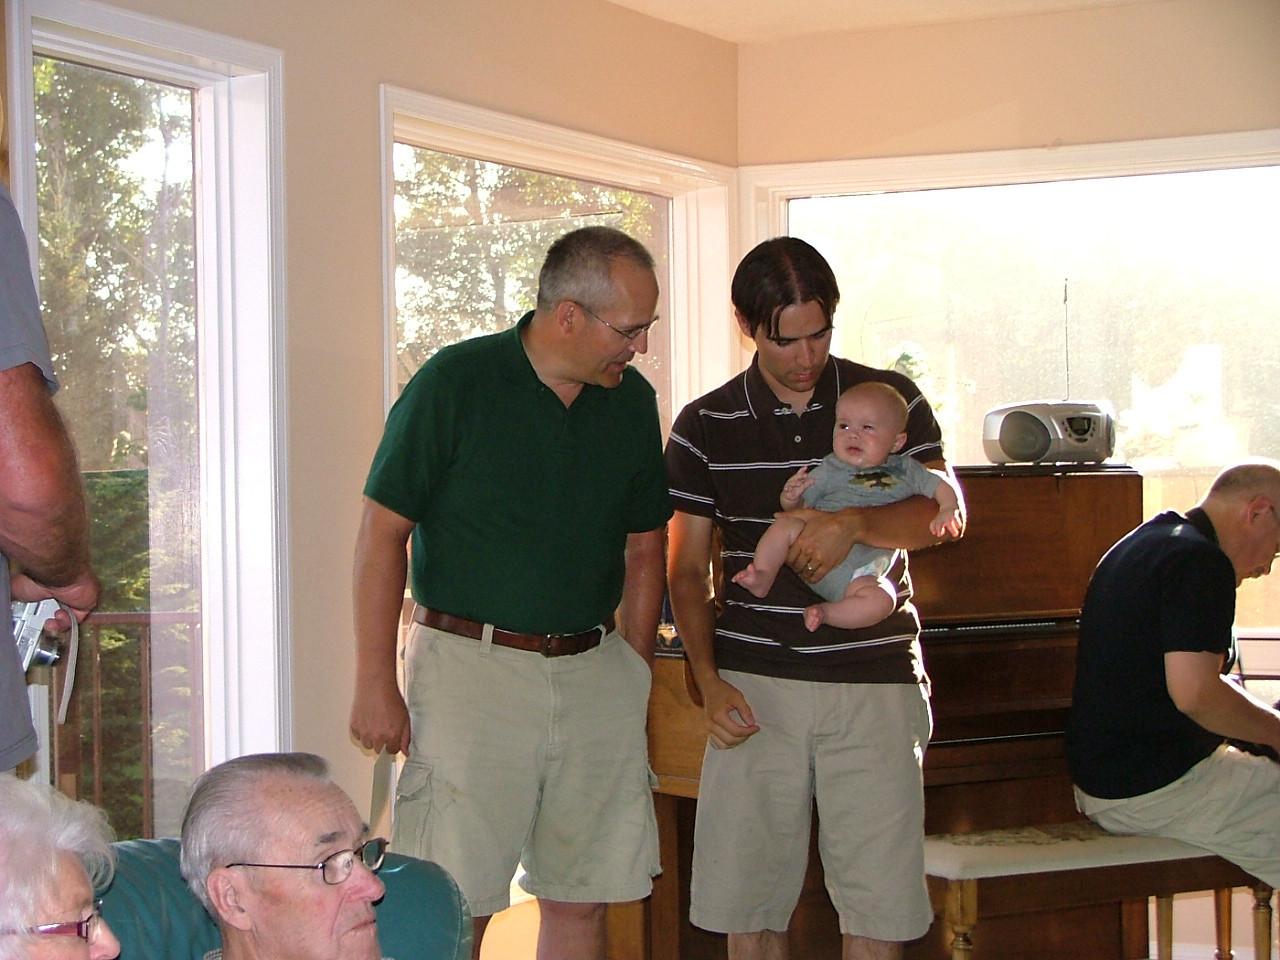 Kent, Scott, baby Liam